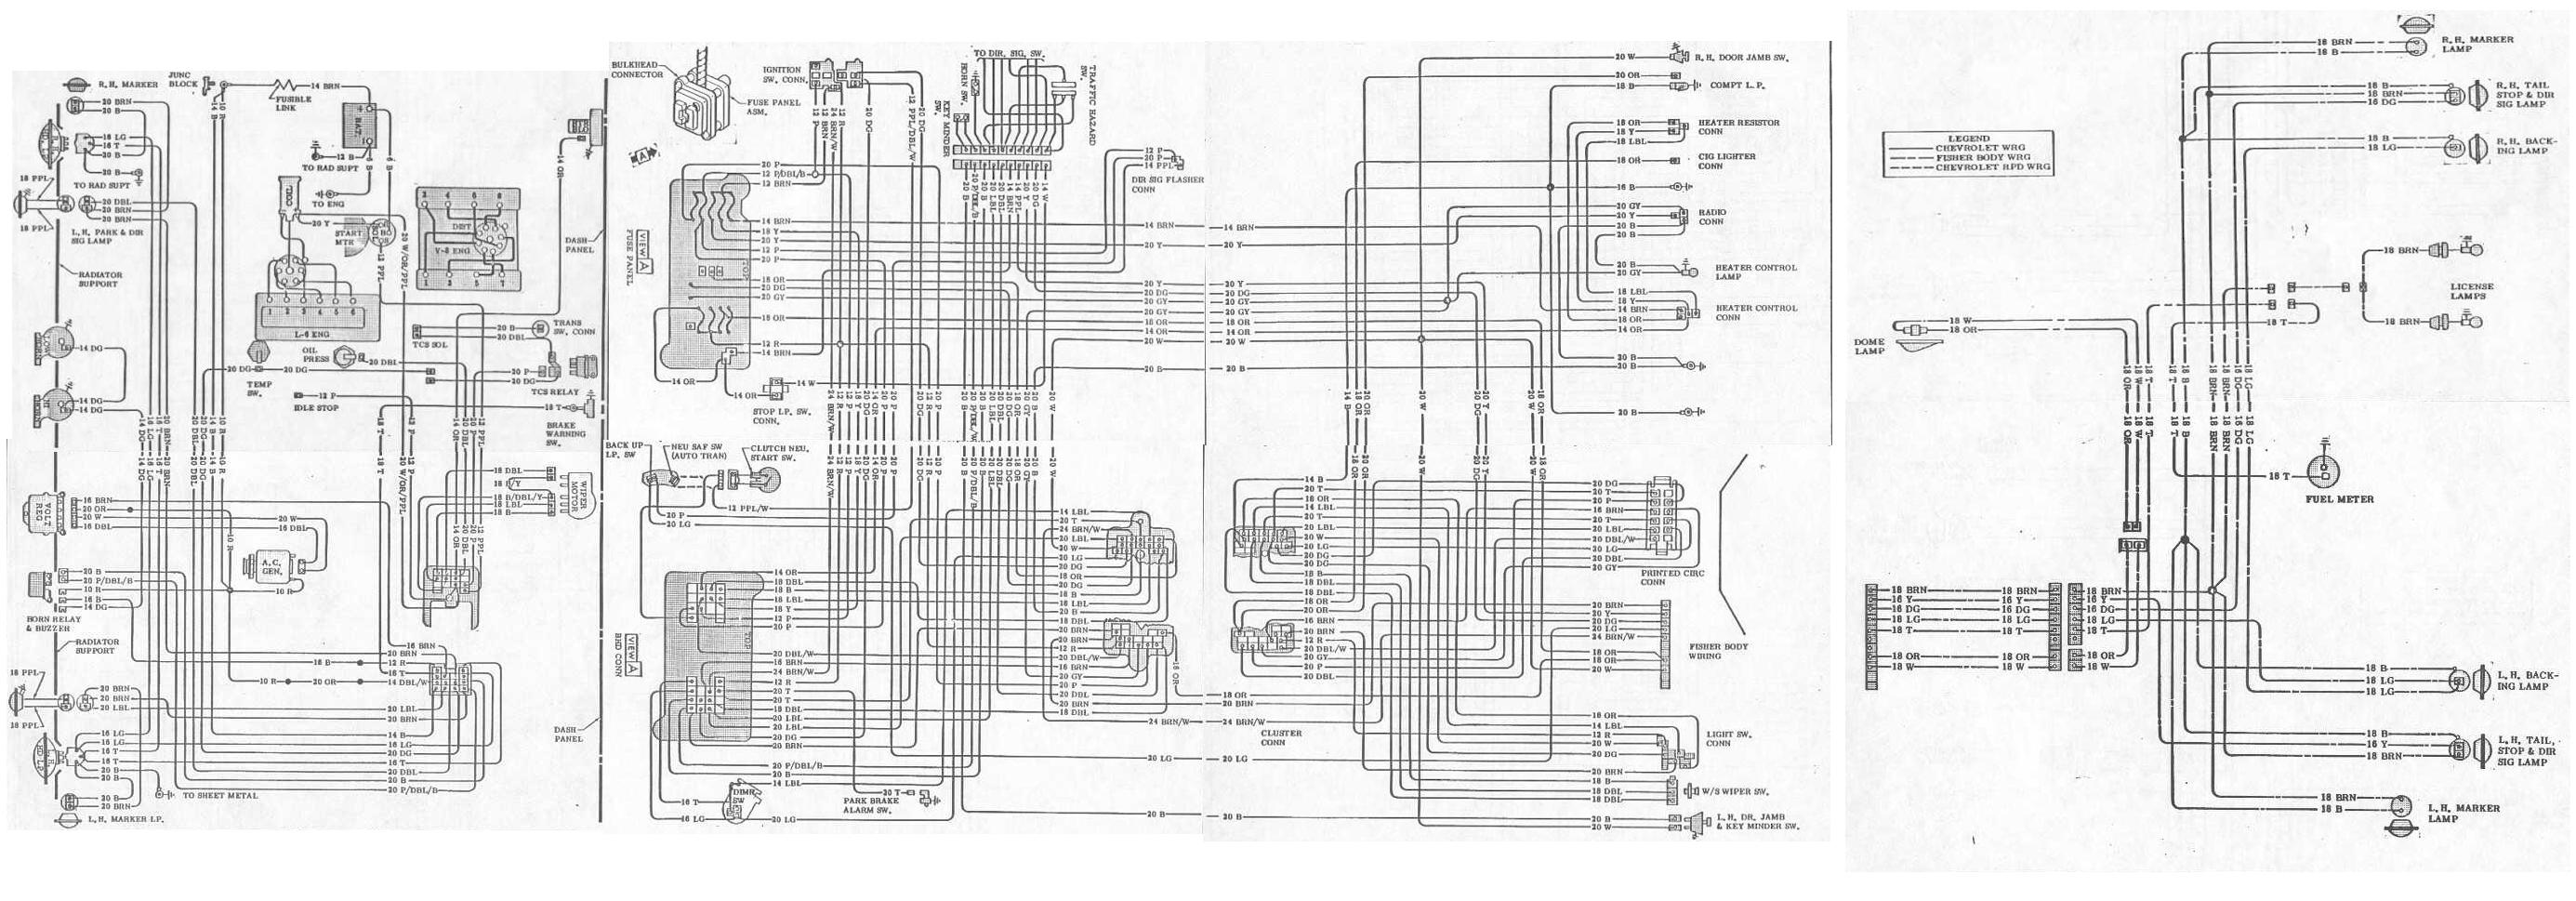 1979 pontiac trans am ac wiring diagram john deere l120 1973 firebird harness get free image